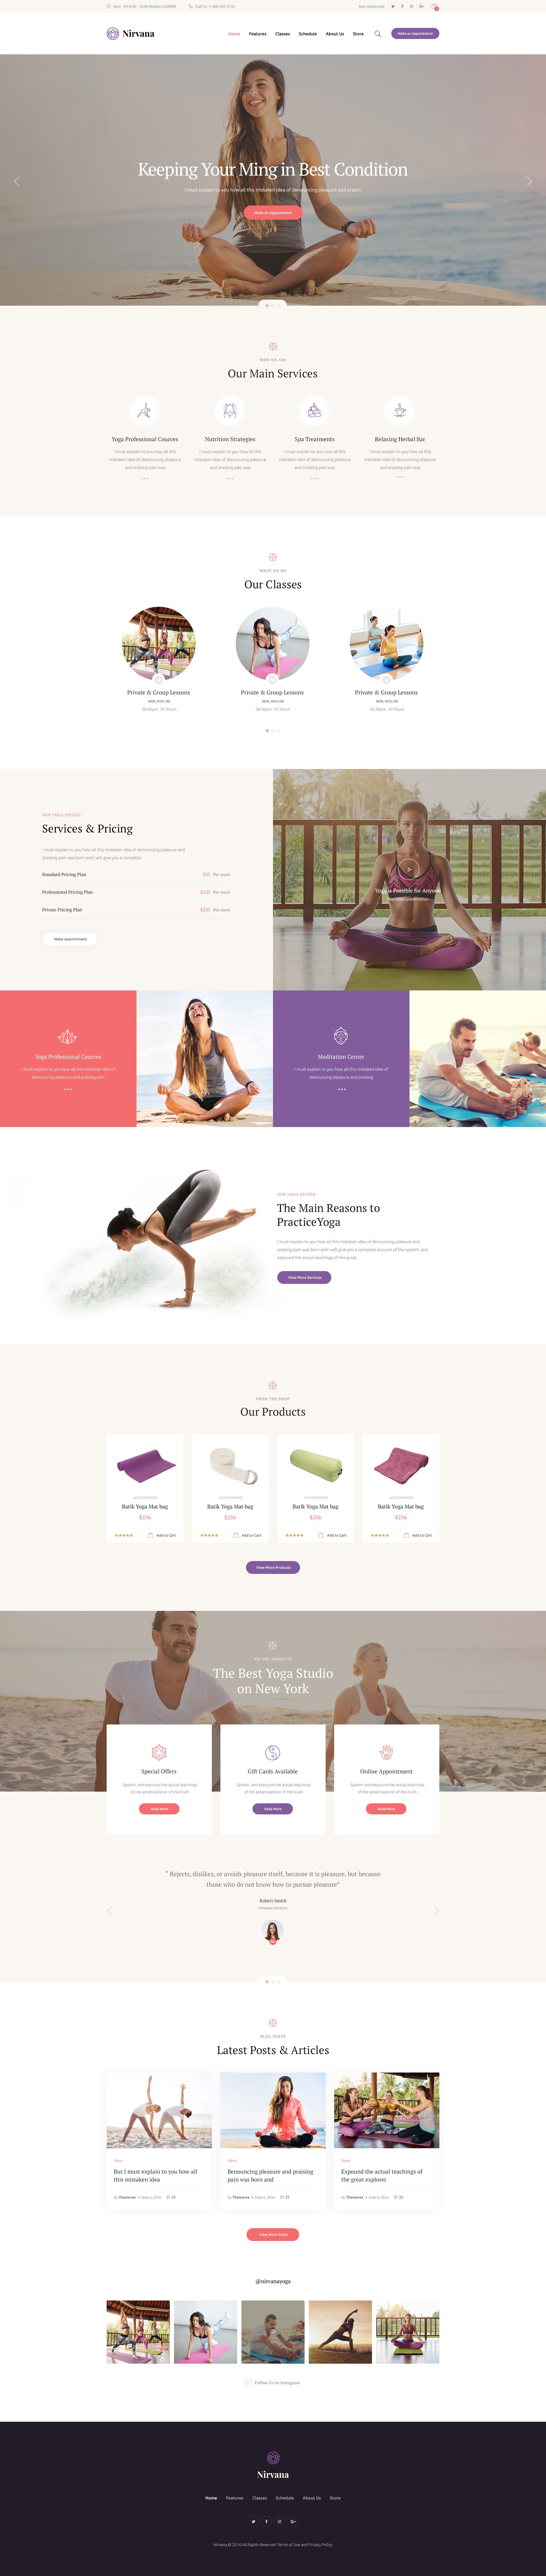 Nirvana Yoga Studio And Fitness Club Wordpress Theme By Axiomthemes